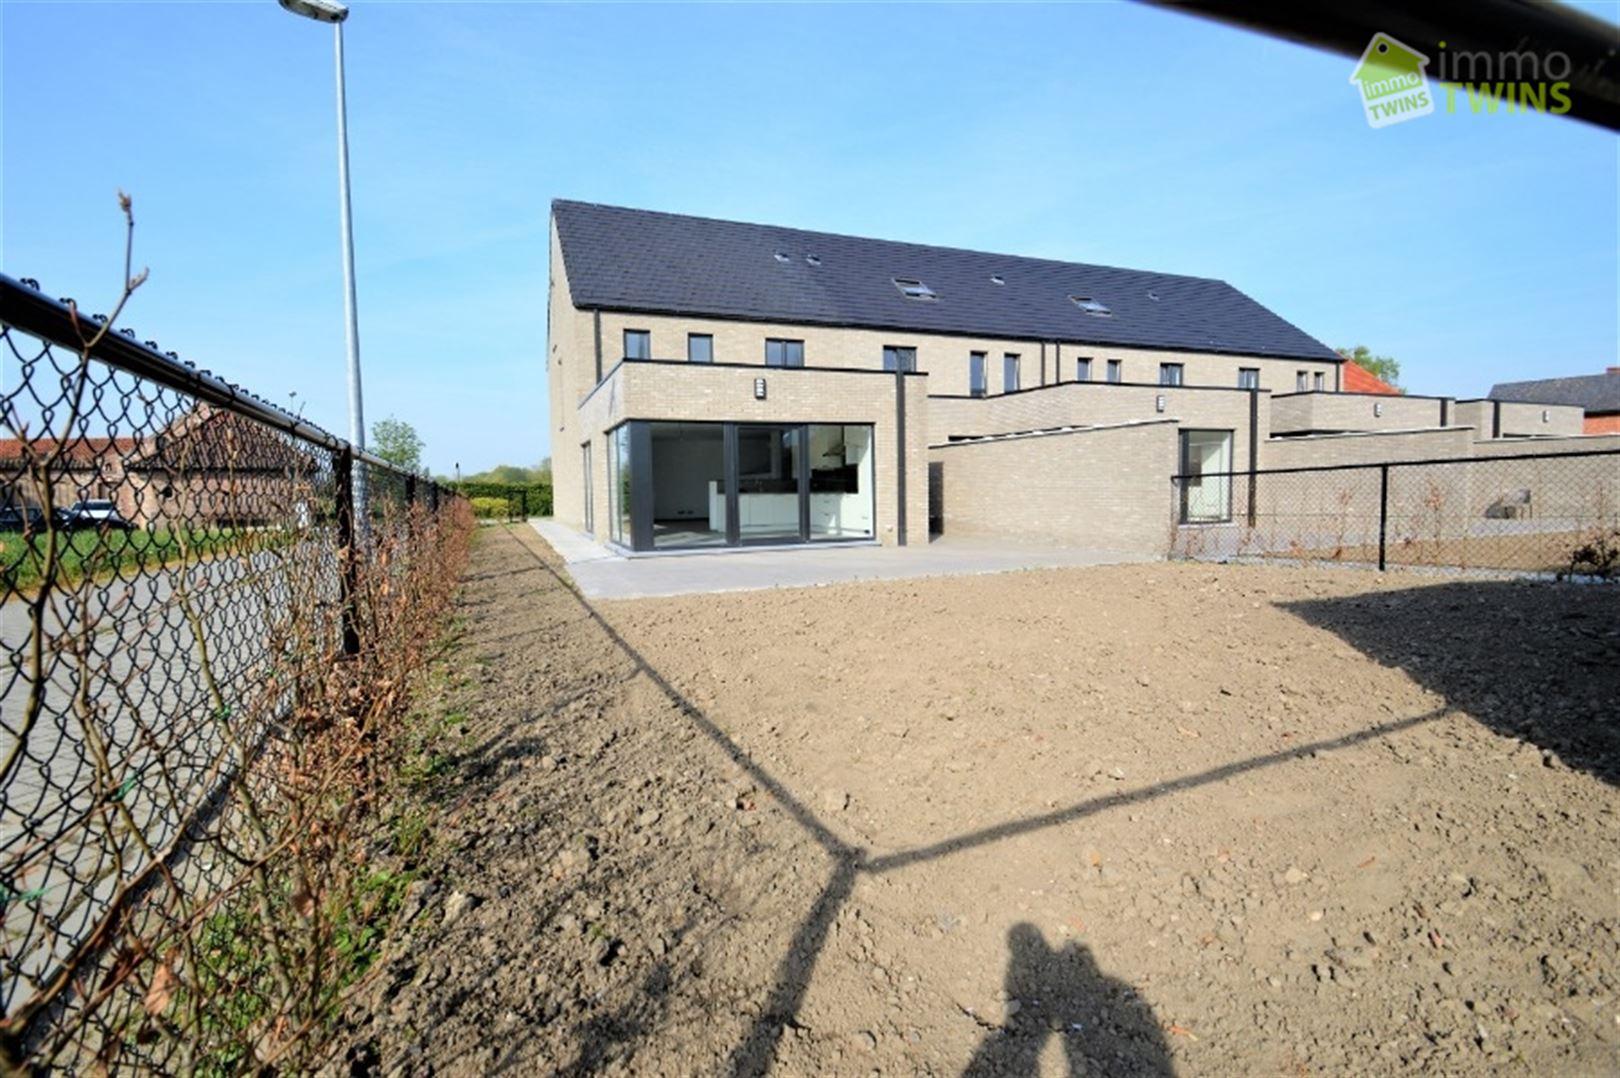 Foto 2 : Woning te 9200 Sint-Gillis-bij-Dendermonde (België) - Prijs € 999